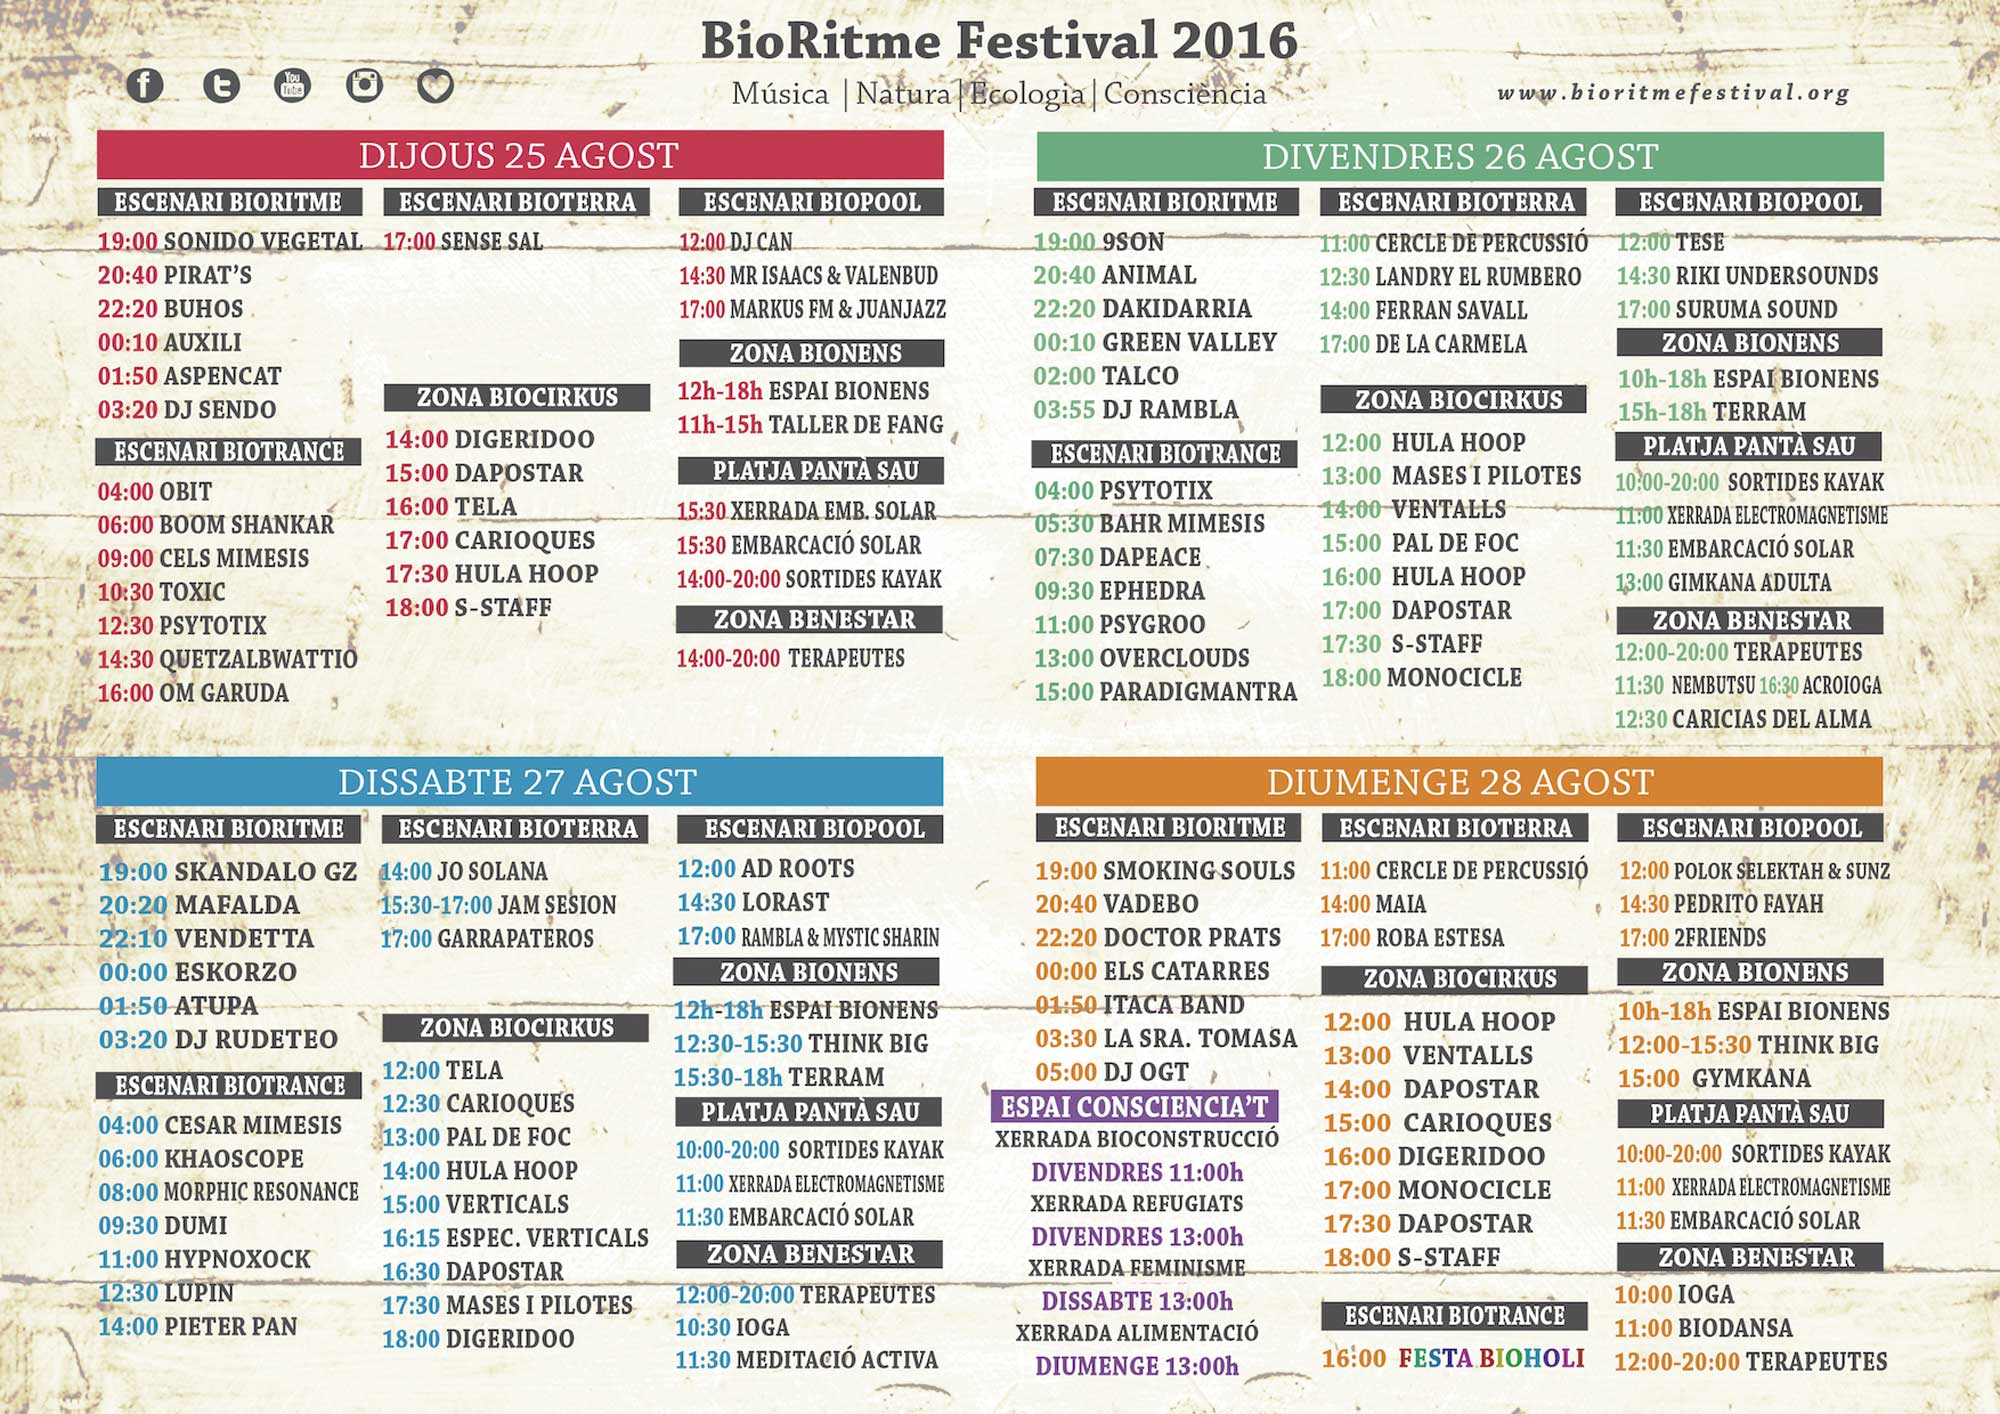 Horarios del Festival Bioritme 2016